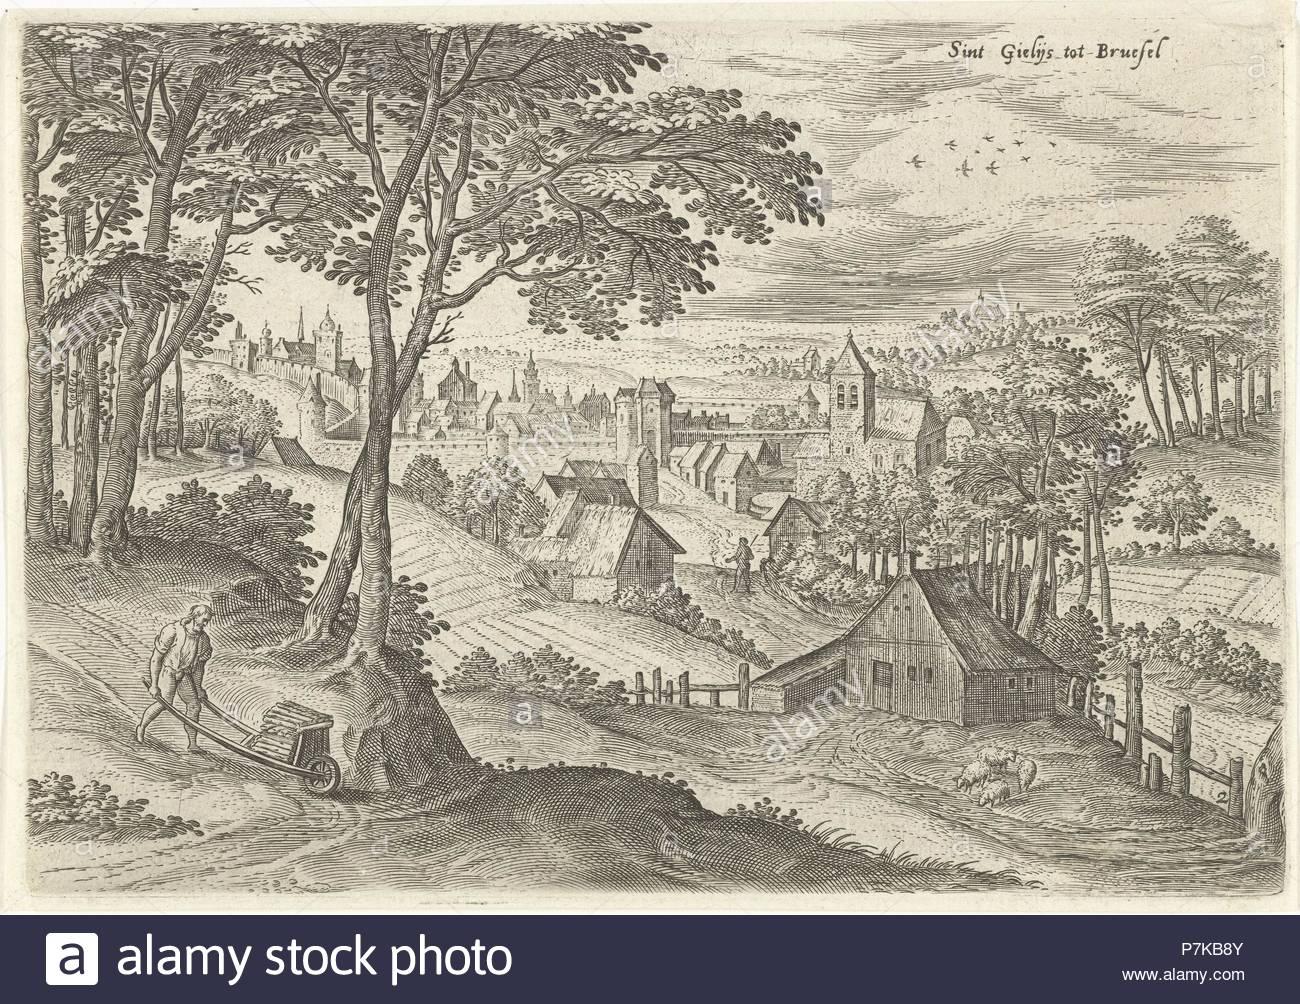 View of Saint-Gilles, Belgium, Hans Collaert (I), Hans Bol, Claes Jansz. Visscher (II), 1530 - 1580. - Stock Image